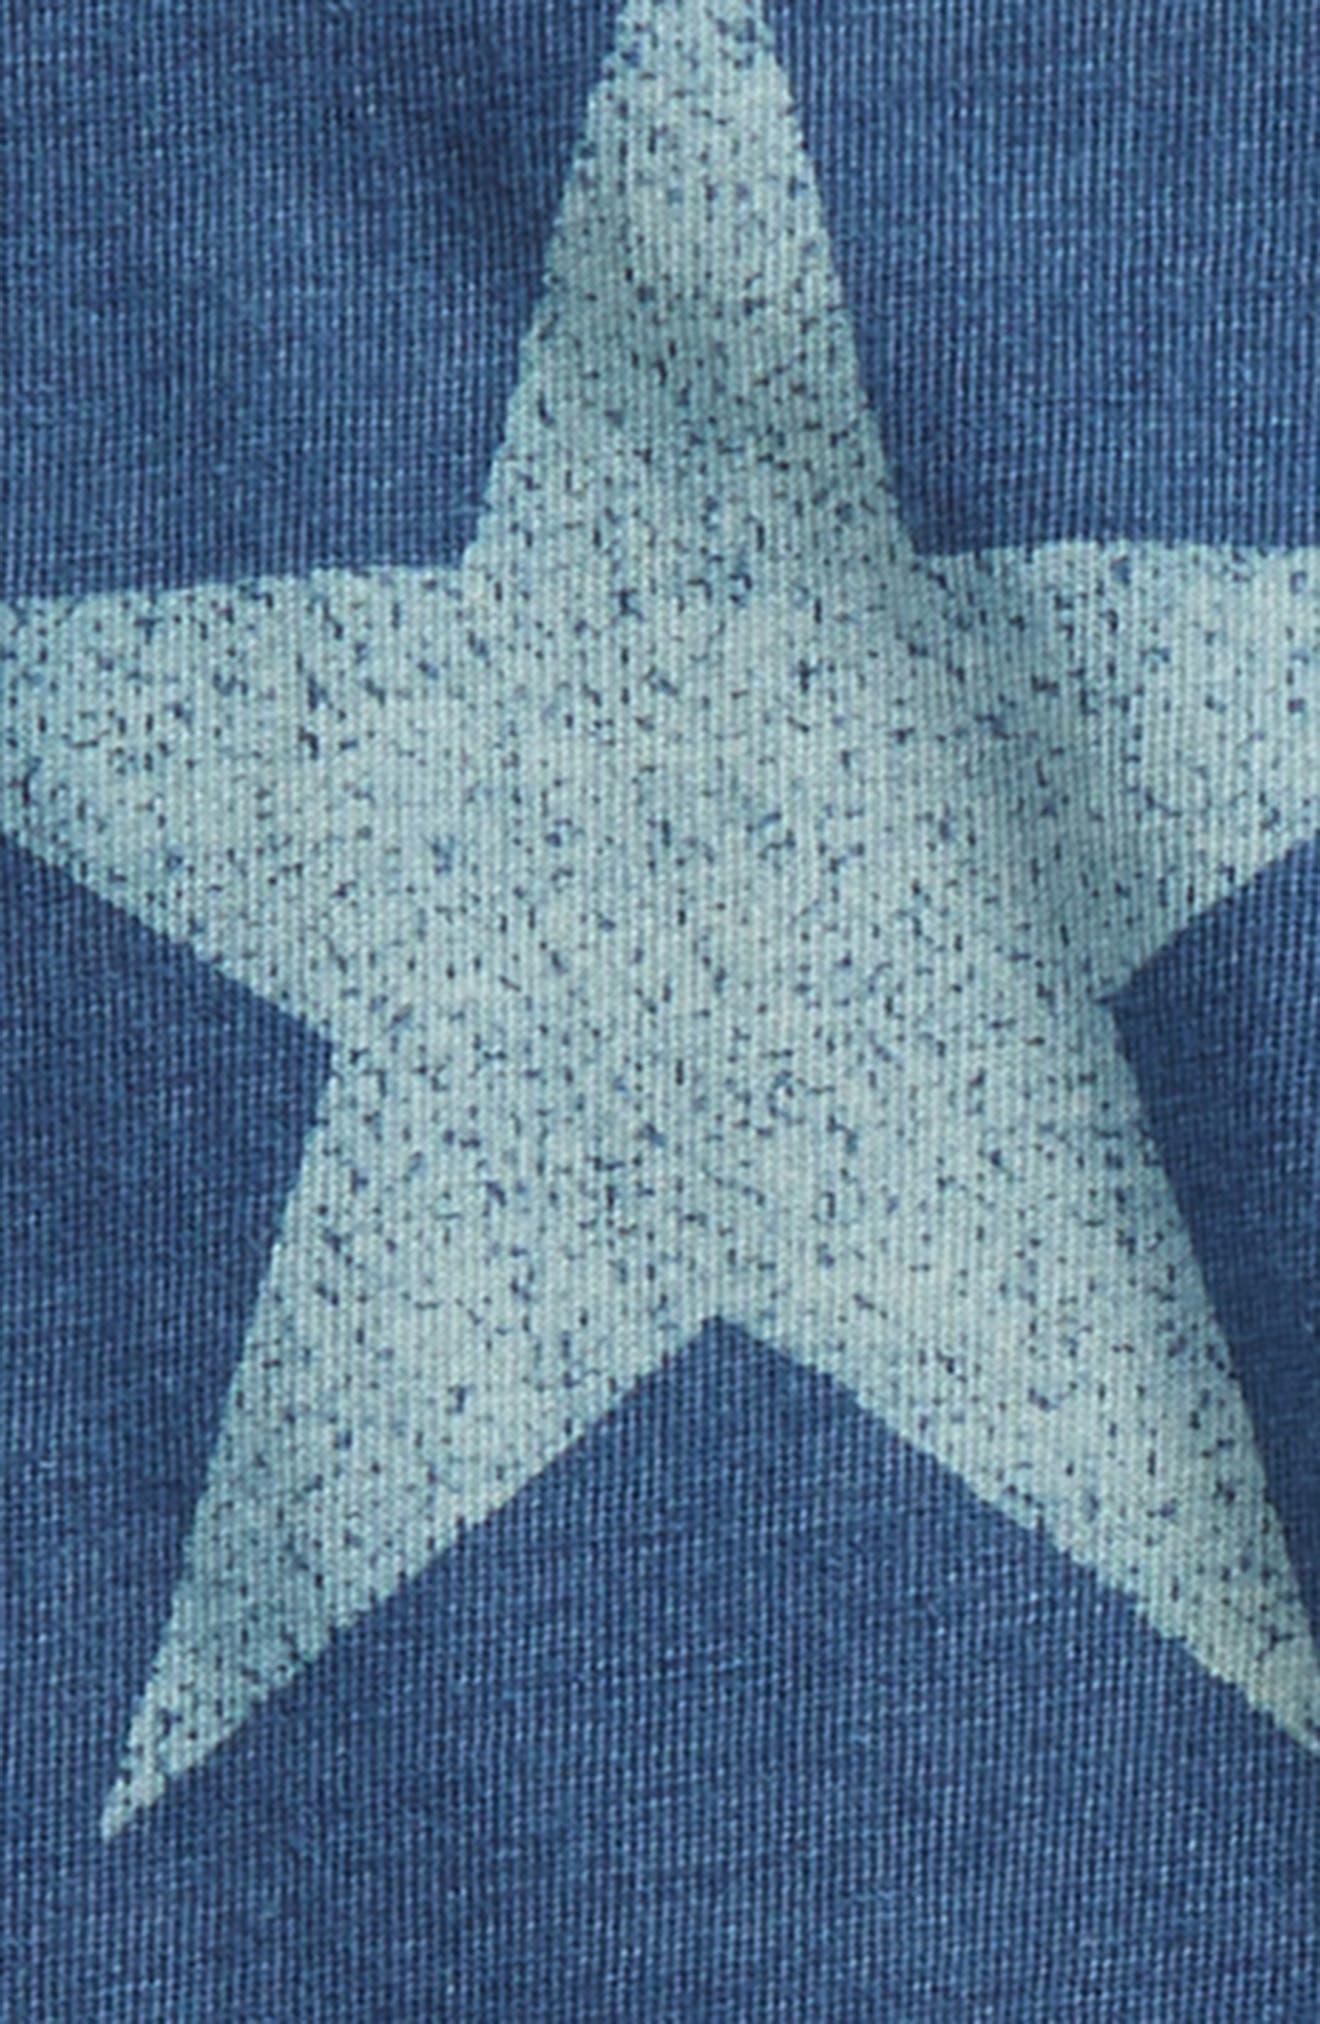 Star Bodysuit & Pants Set,                             Alternate thumbnail 2, color,                             401